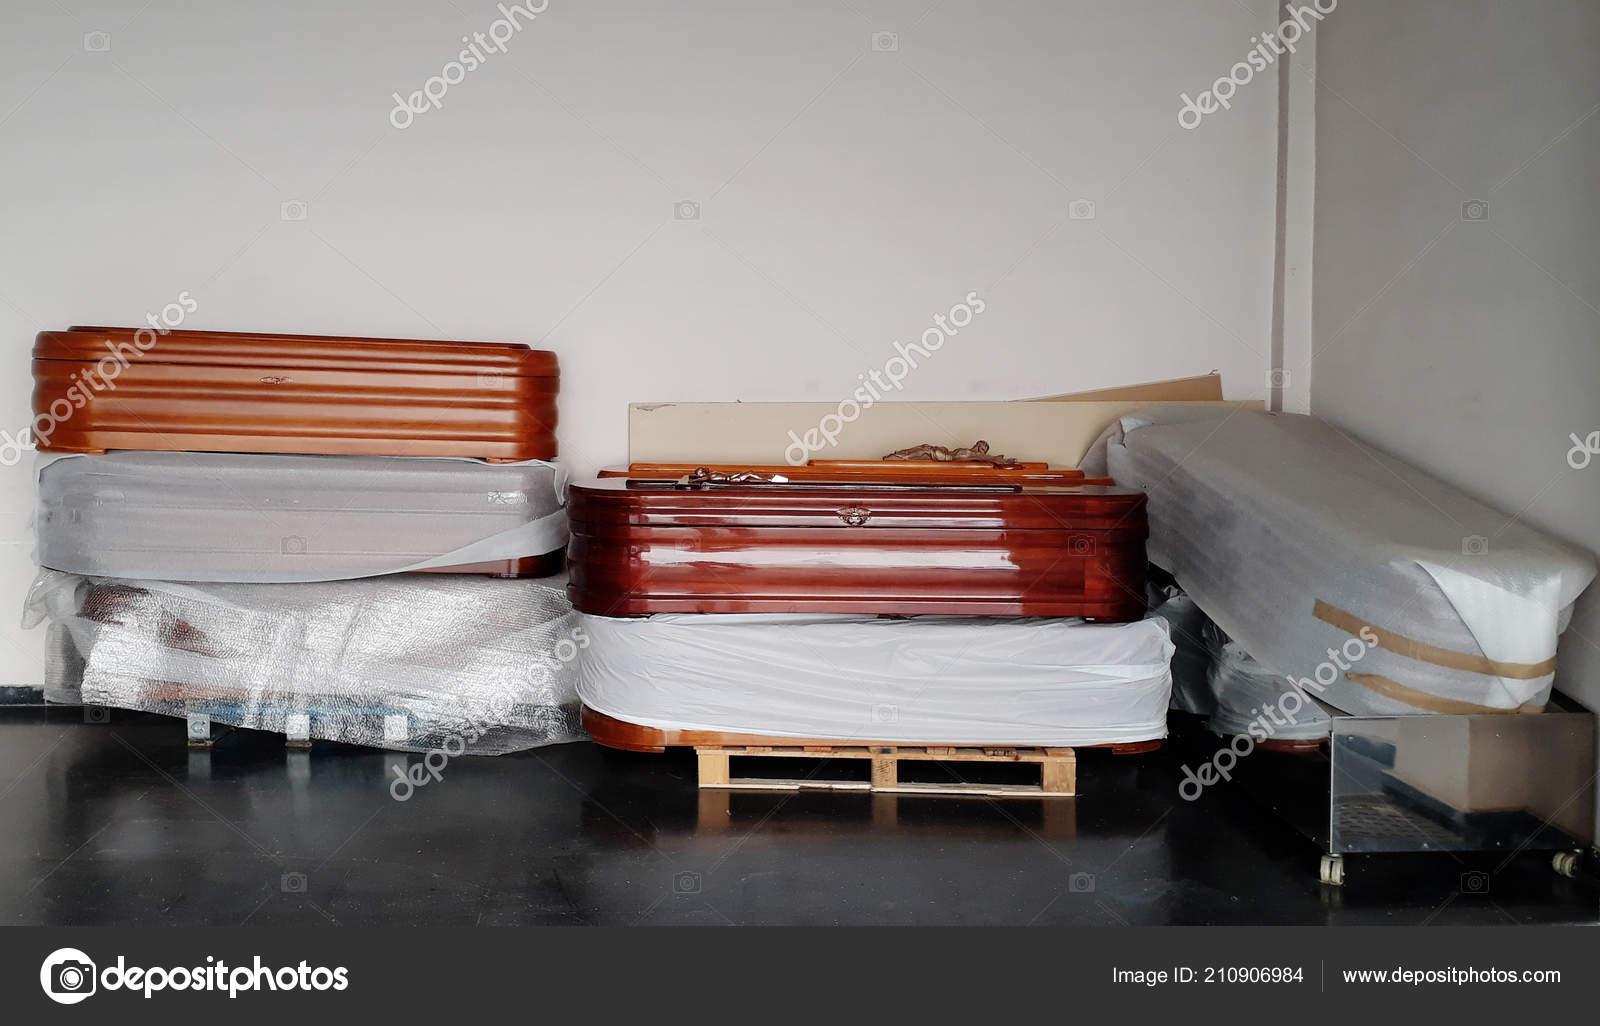 eb800722e87 Νέα Φέρετρα Στοιβάζονται Μια Αποθήκη Του Κηδεία Σαλόνι — Φωτογραφία Αρχείου